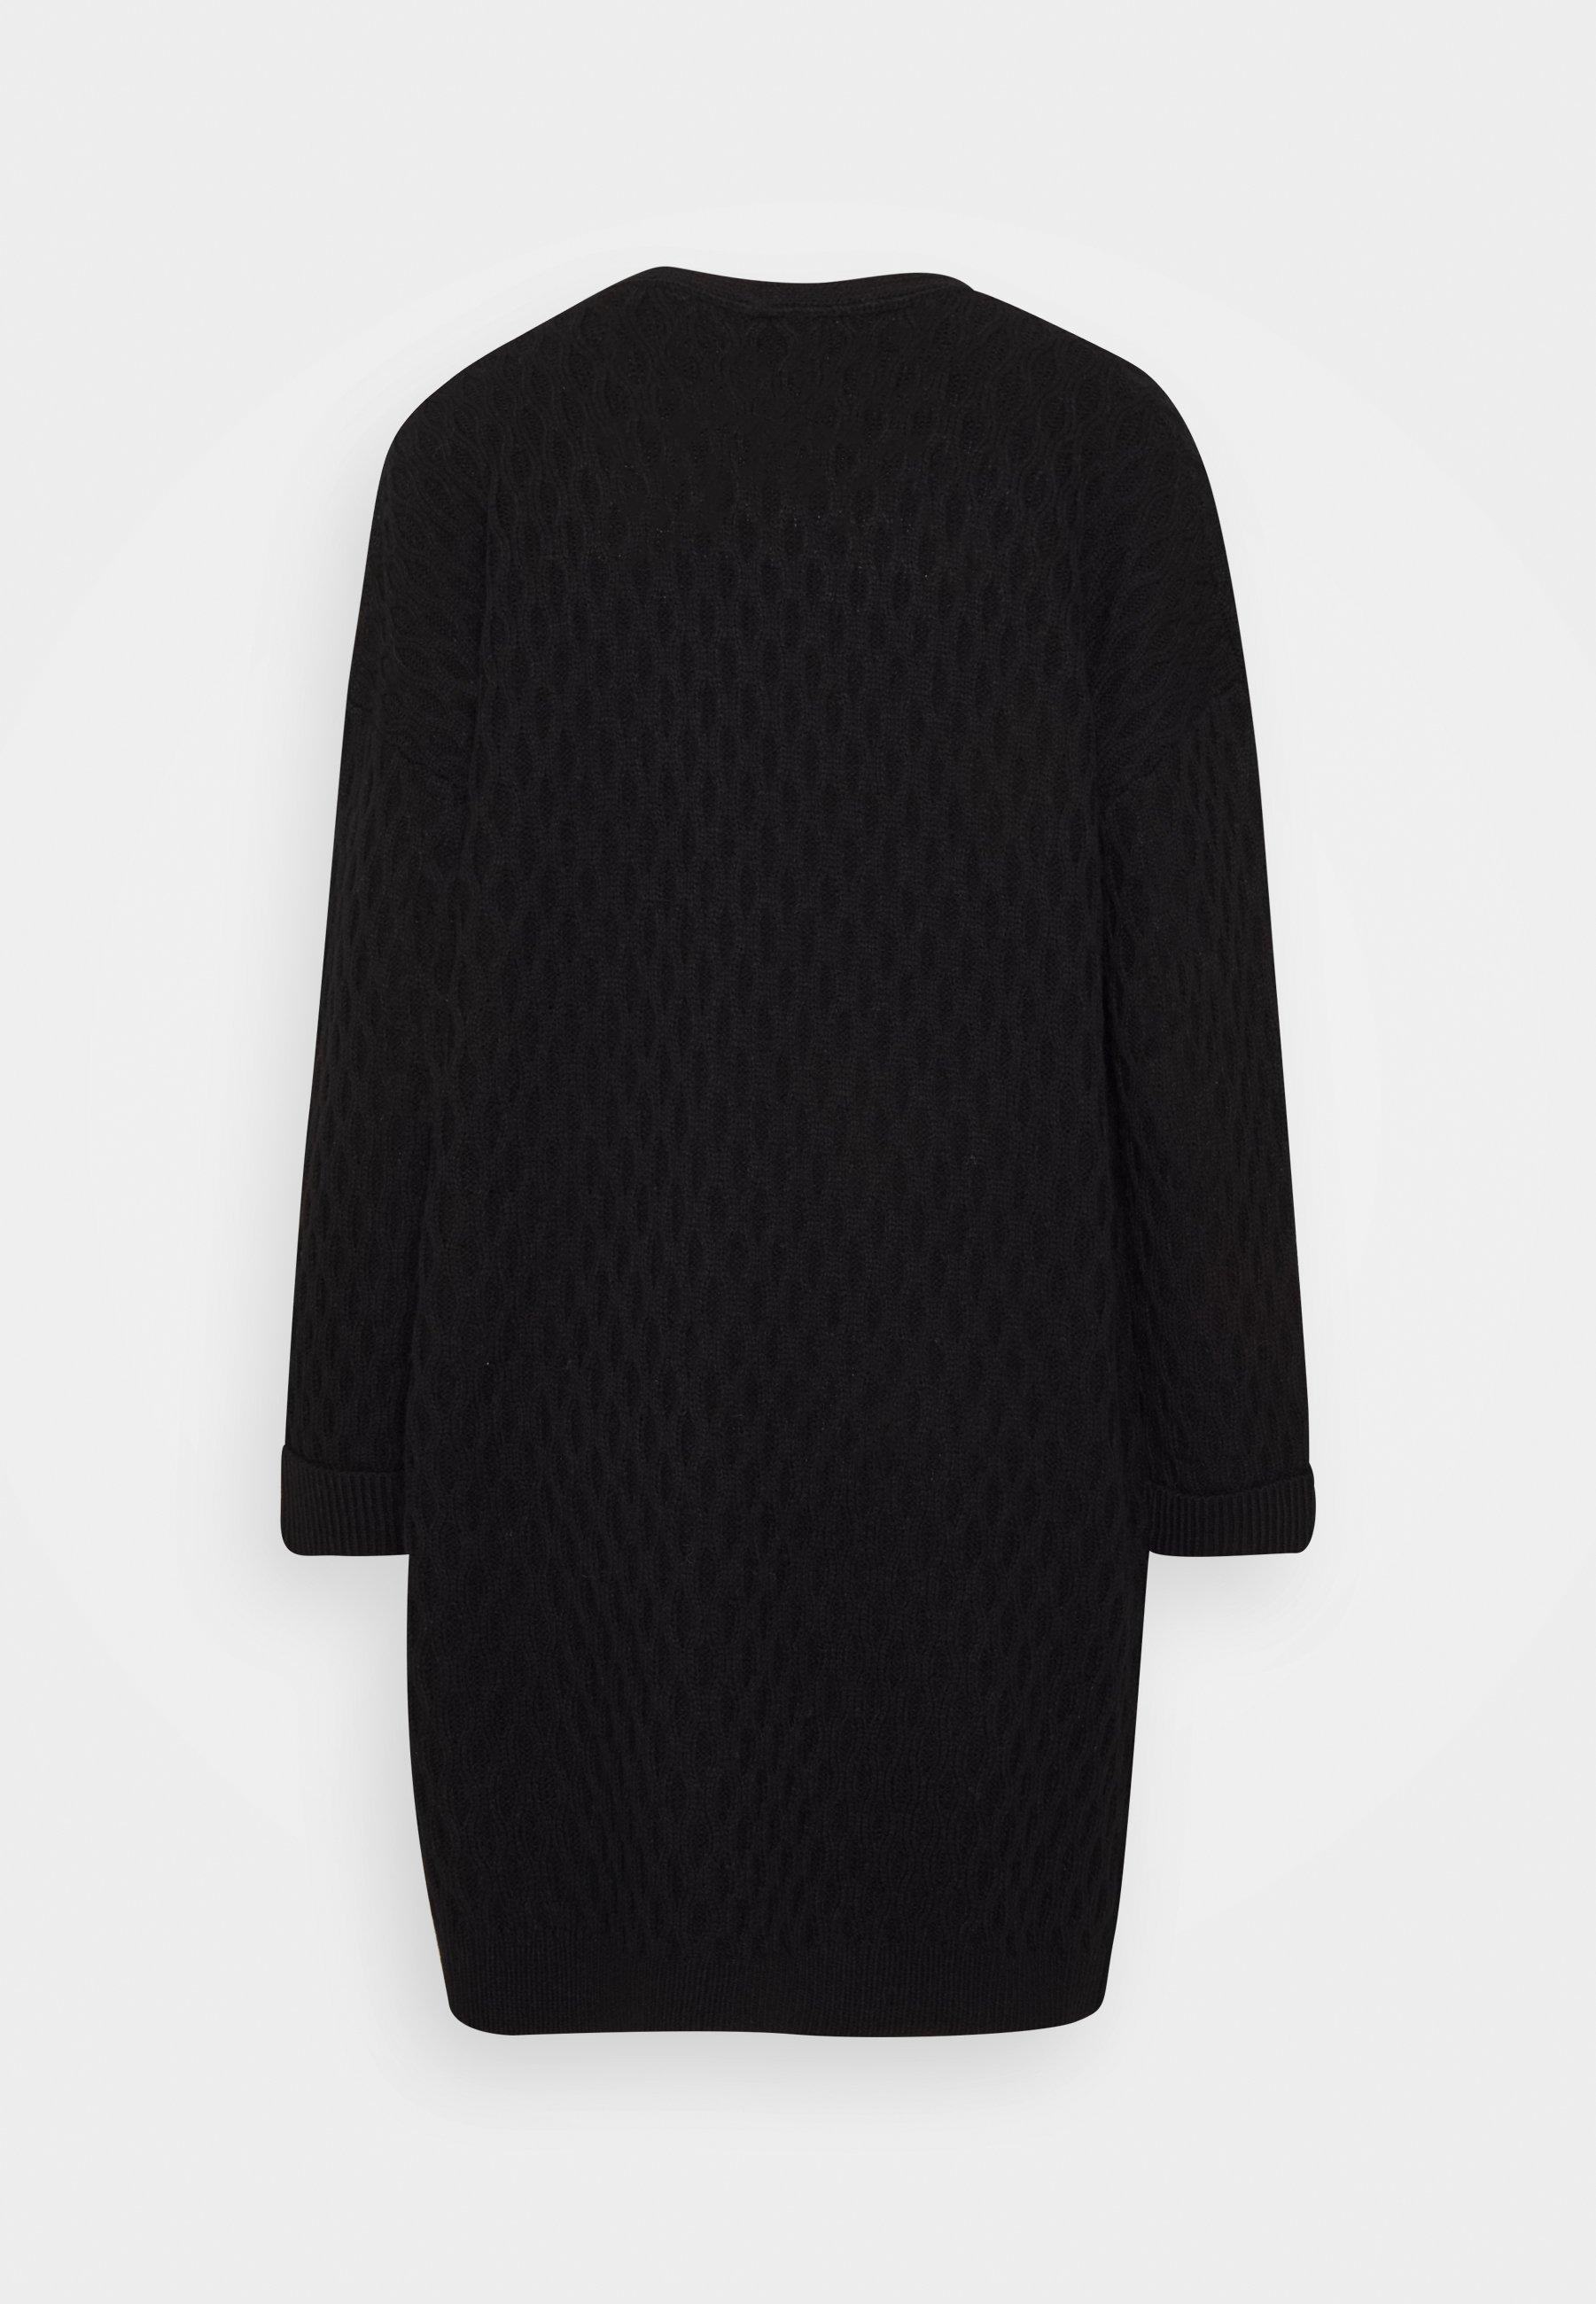 Fashion Union Awesome - Cardigan Black